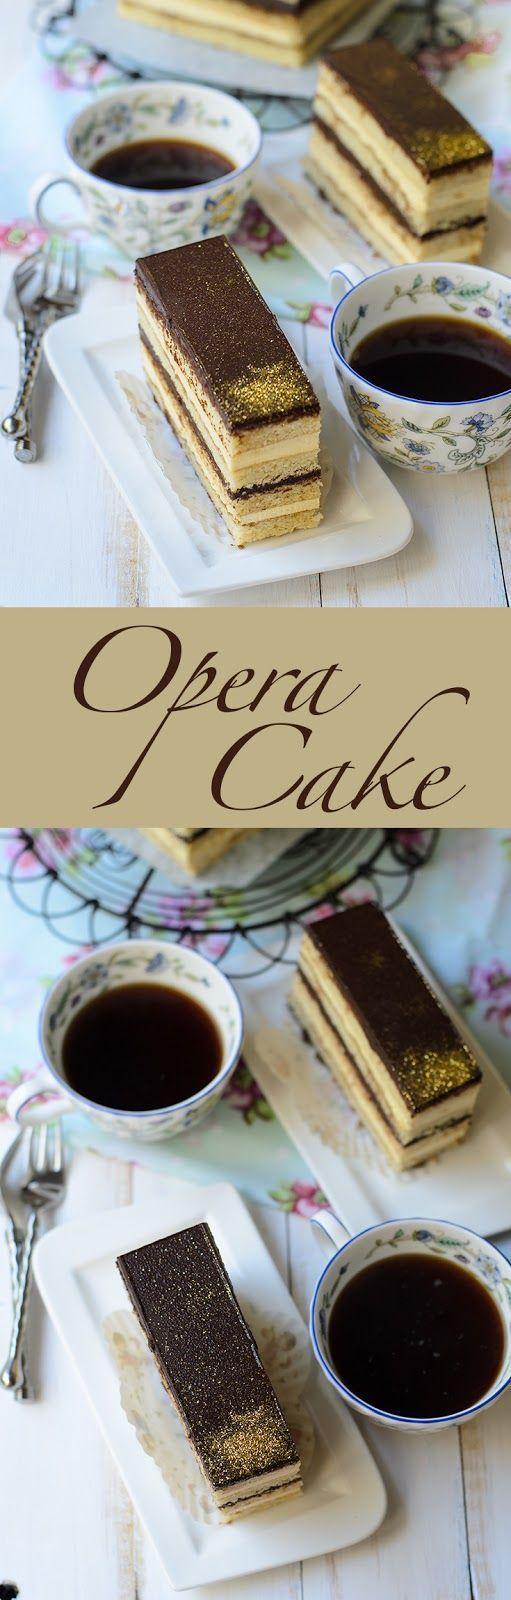 Best 25 Opera Cake Ideas On Pinterest Chocolate